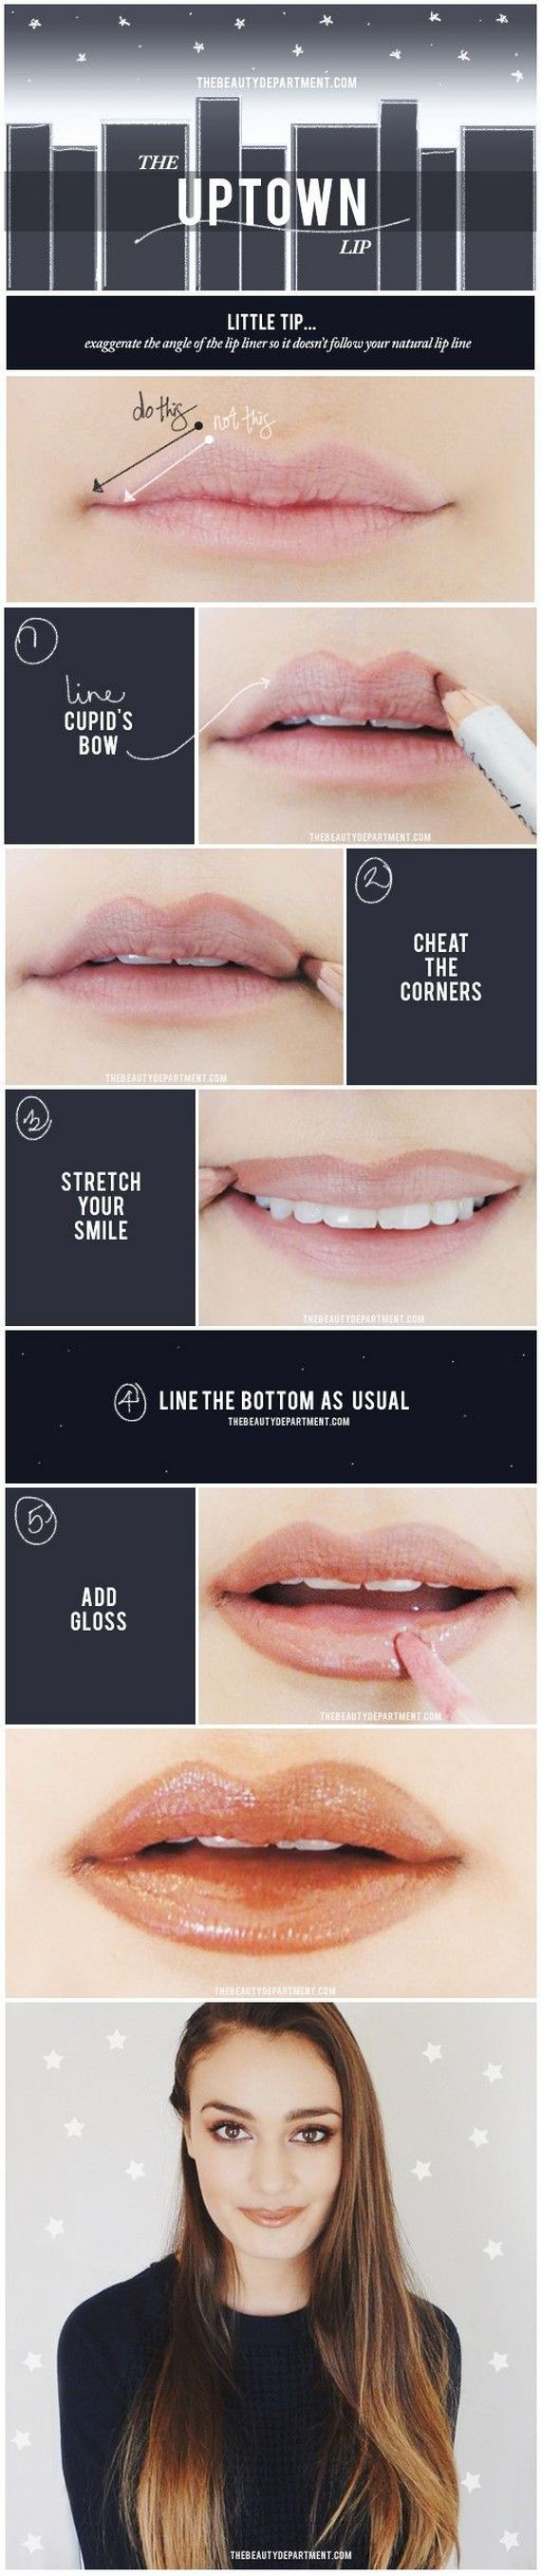 03-Fuller-Lips - Copy